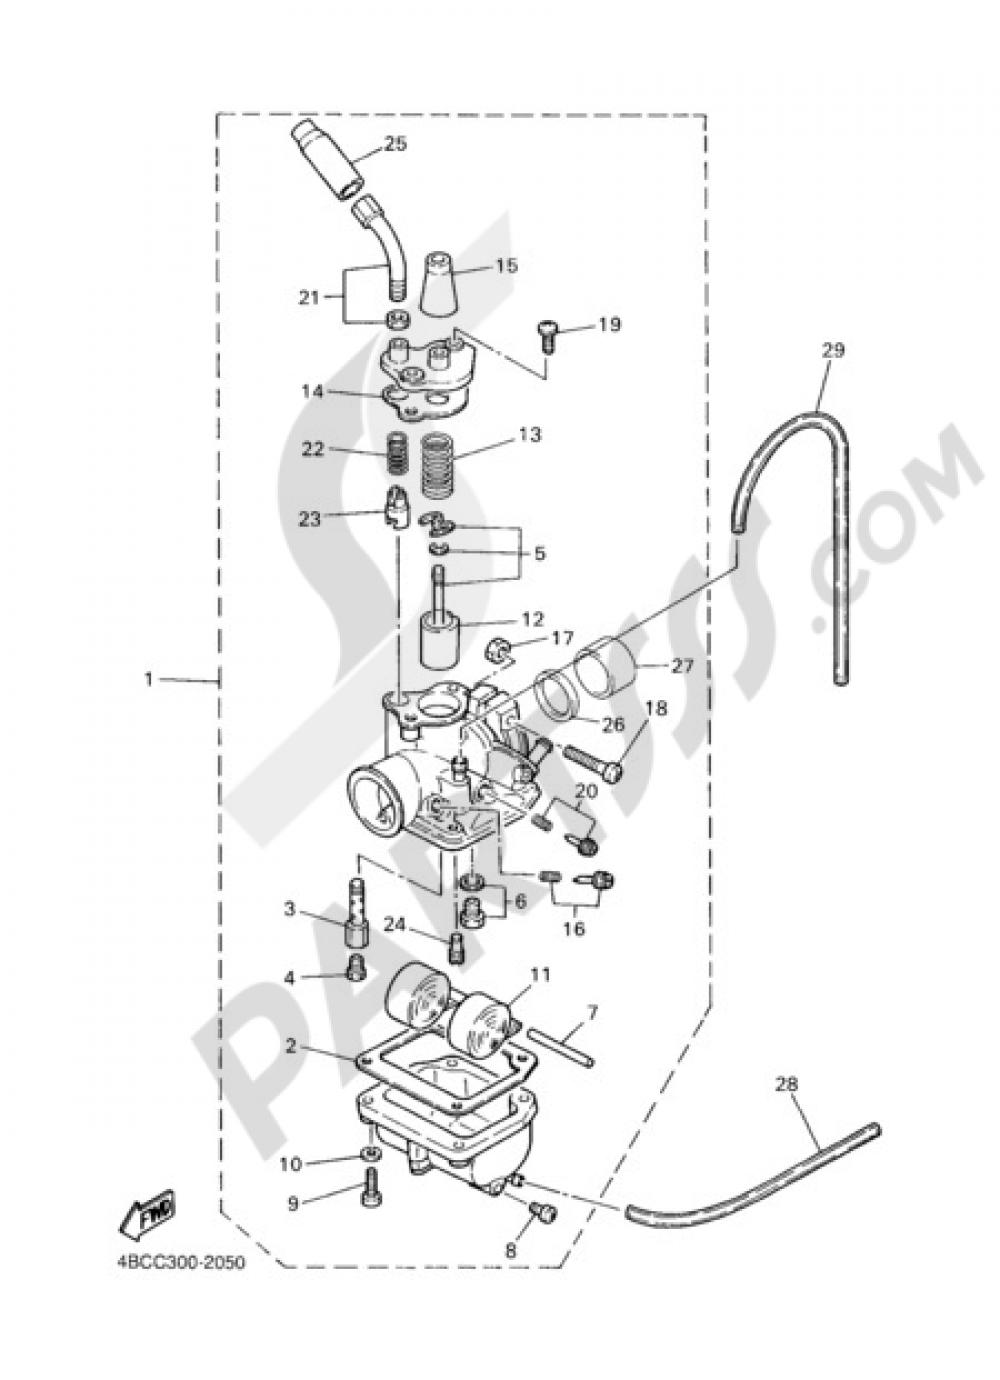 33 Yamaha Pw80 Carburetor Diagram